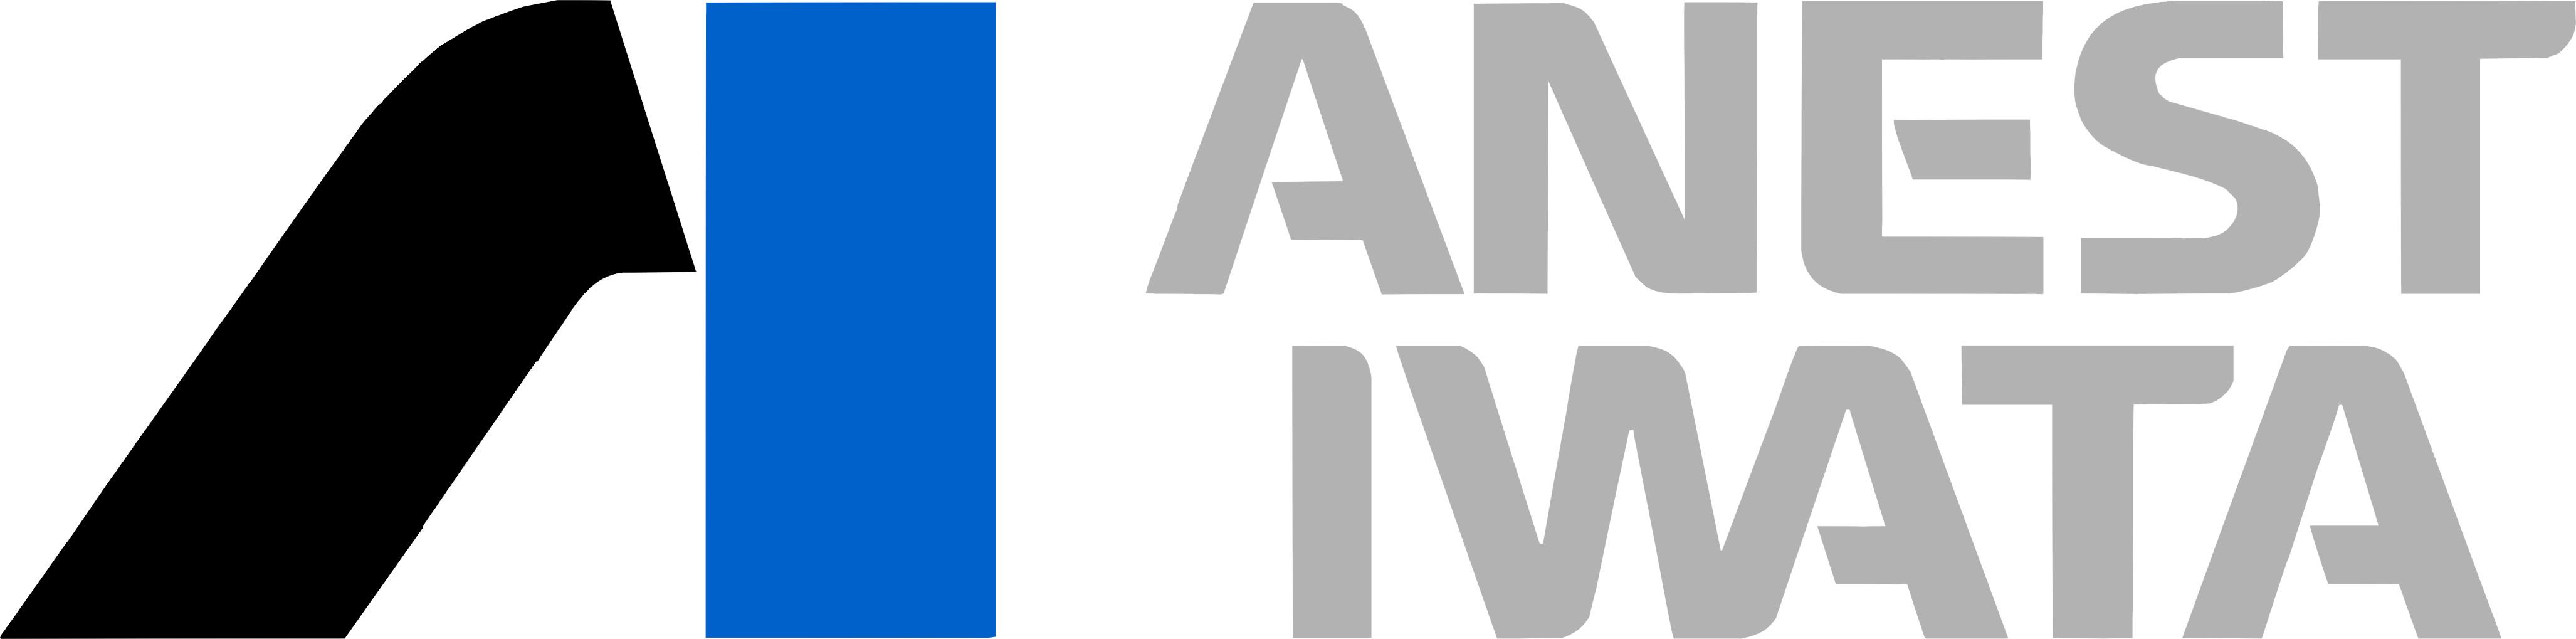 anest-iwata-logo-color-hi-res.jpg